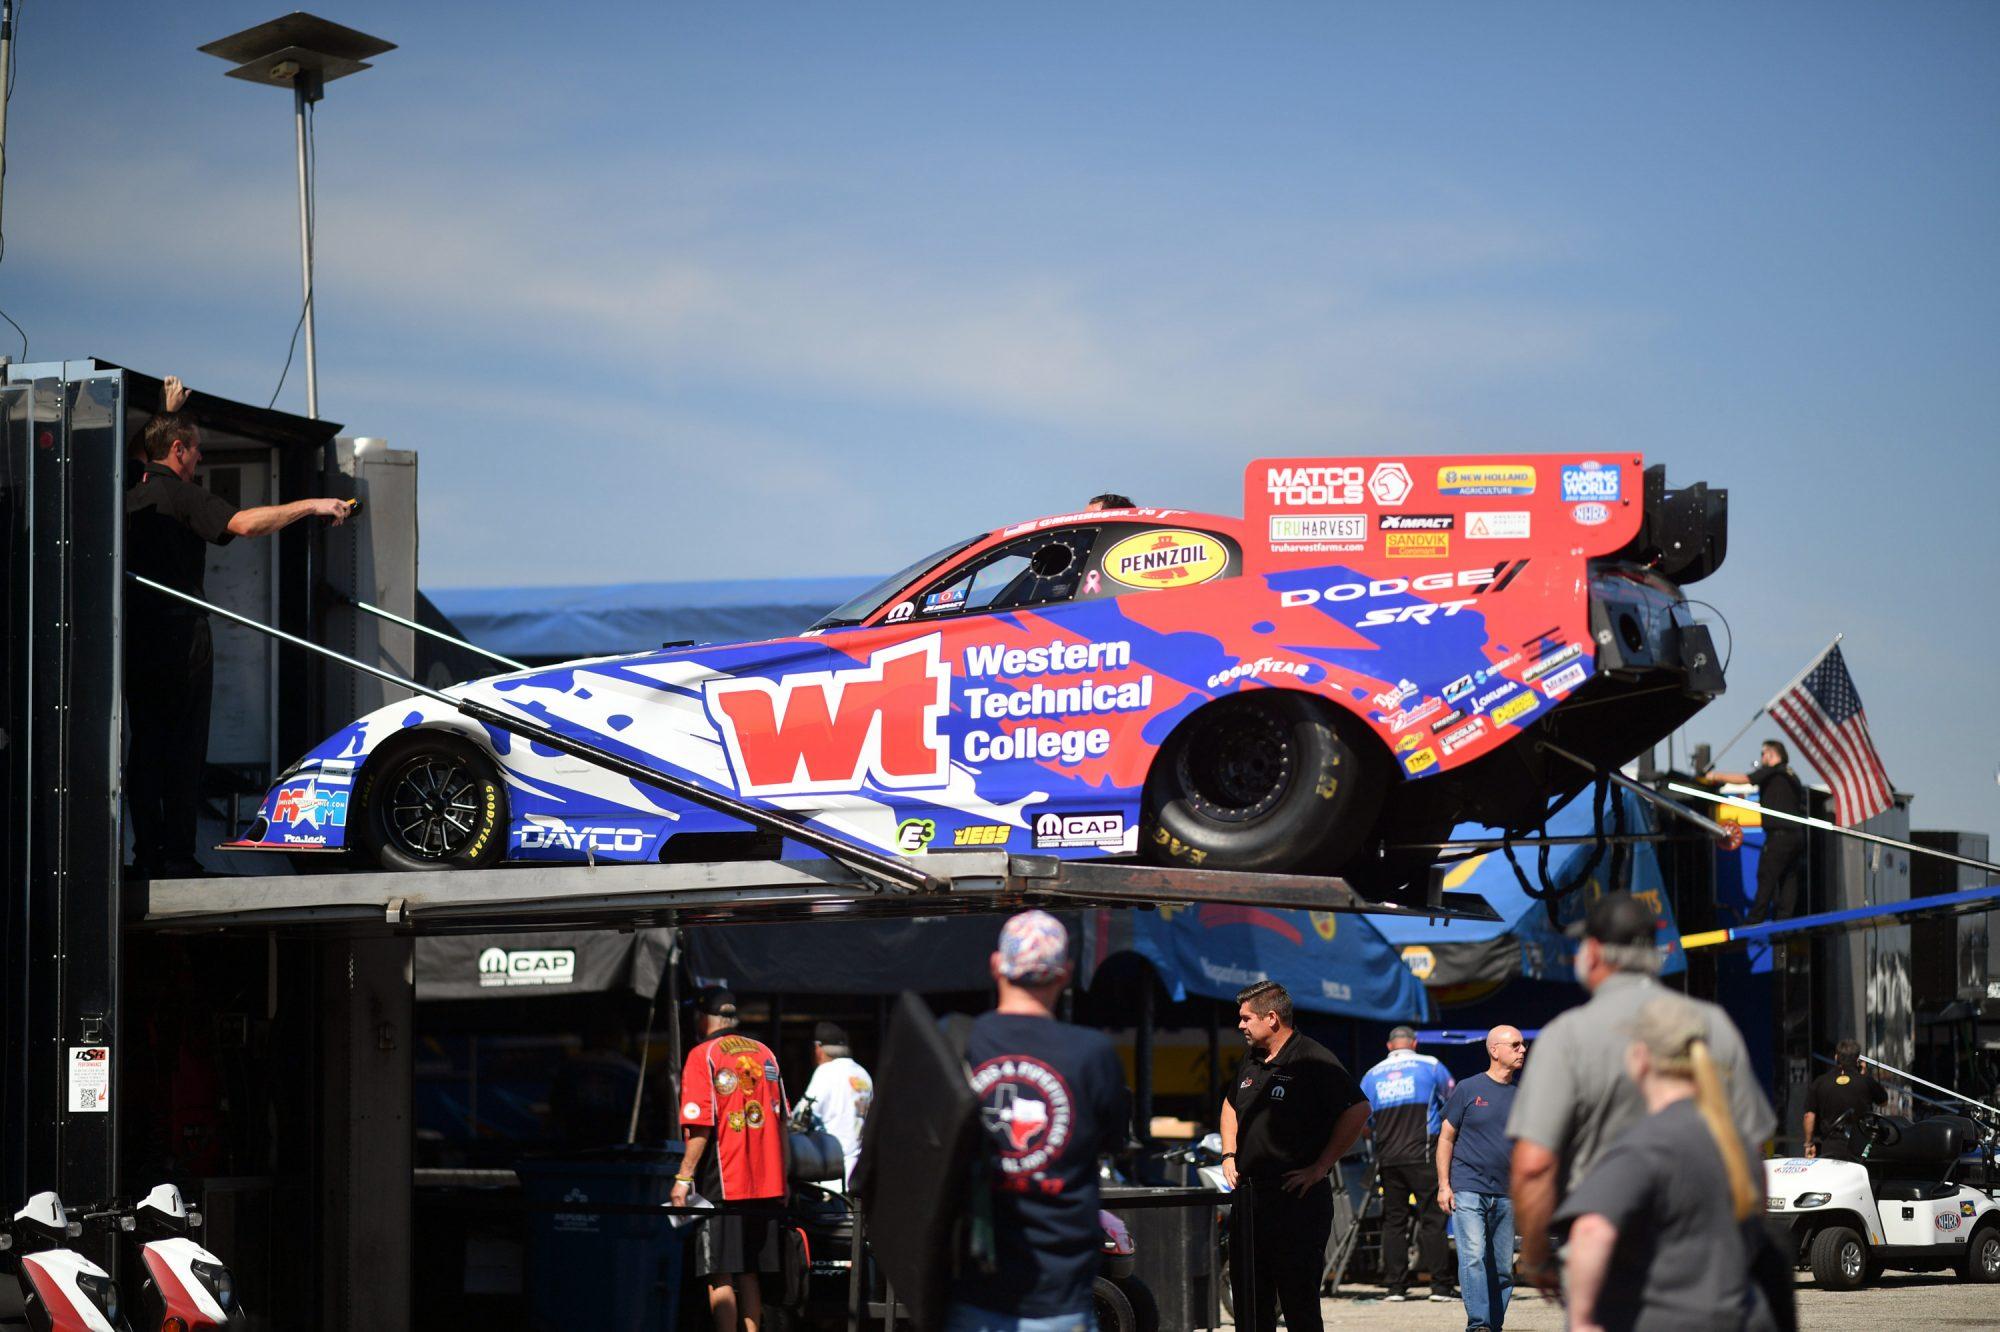 Matt Hagan's car coming off the trailer